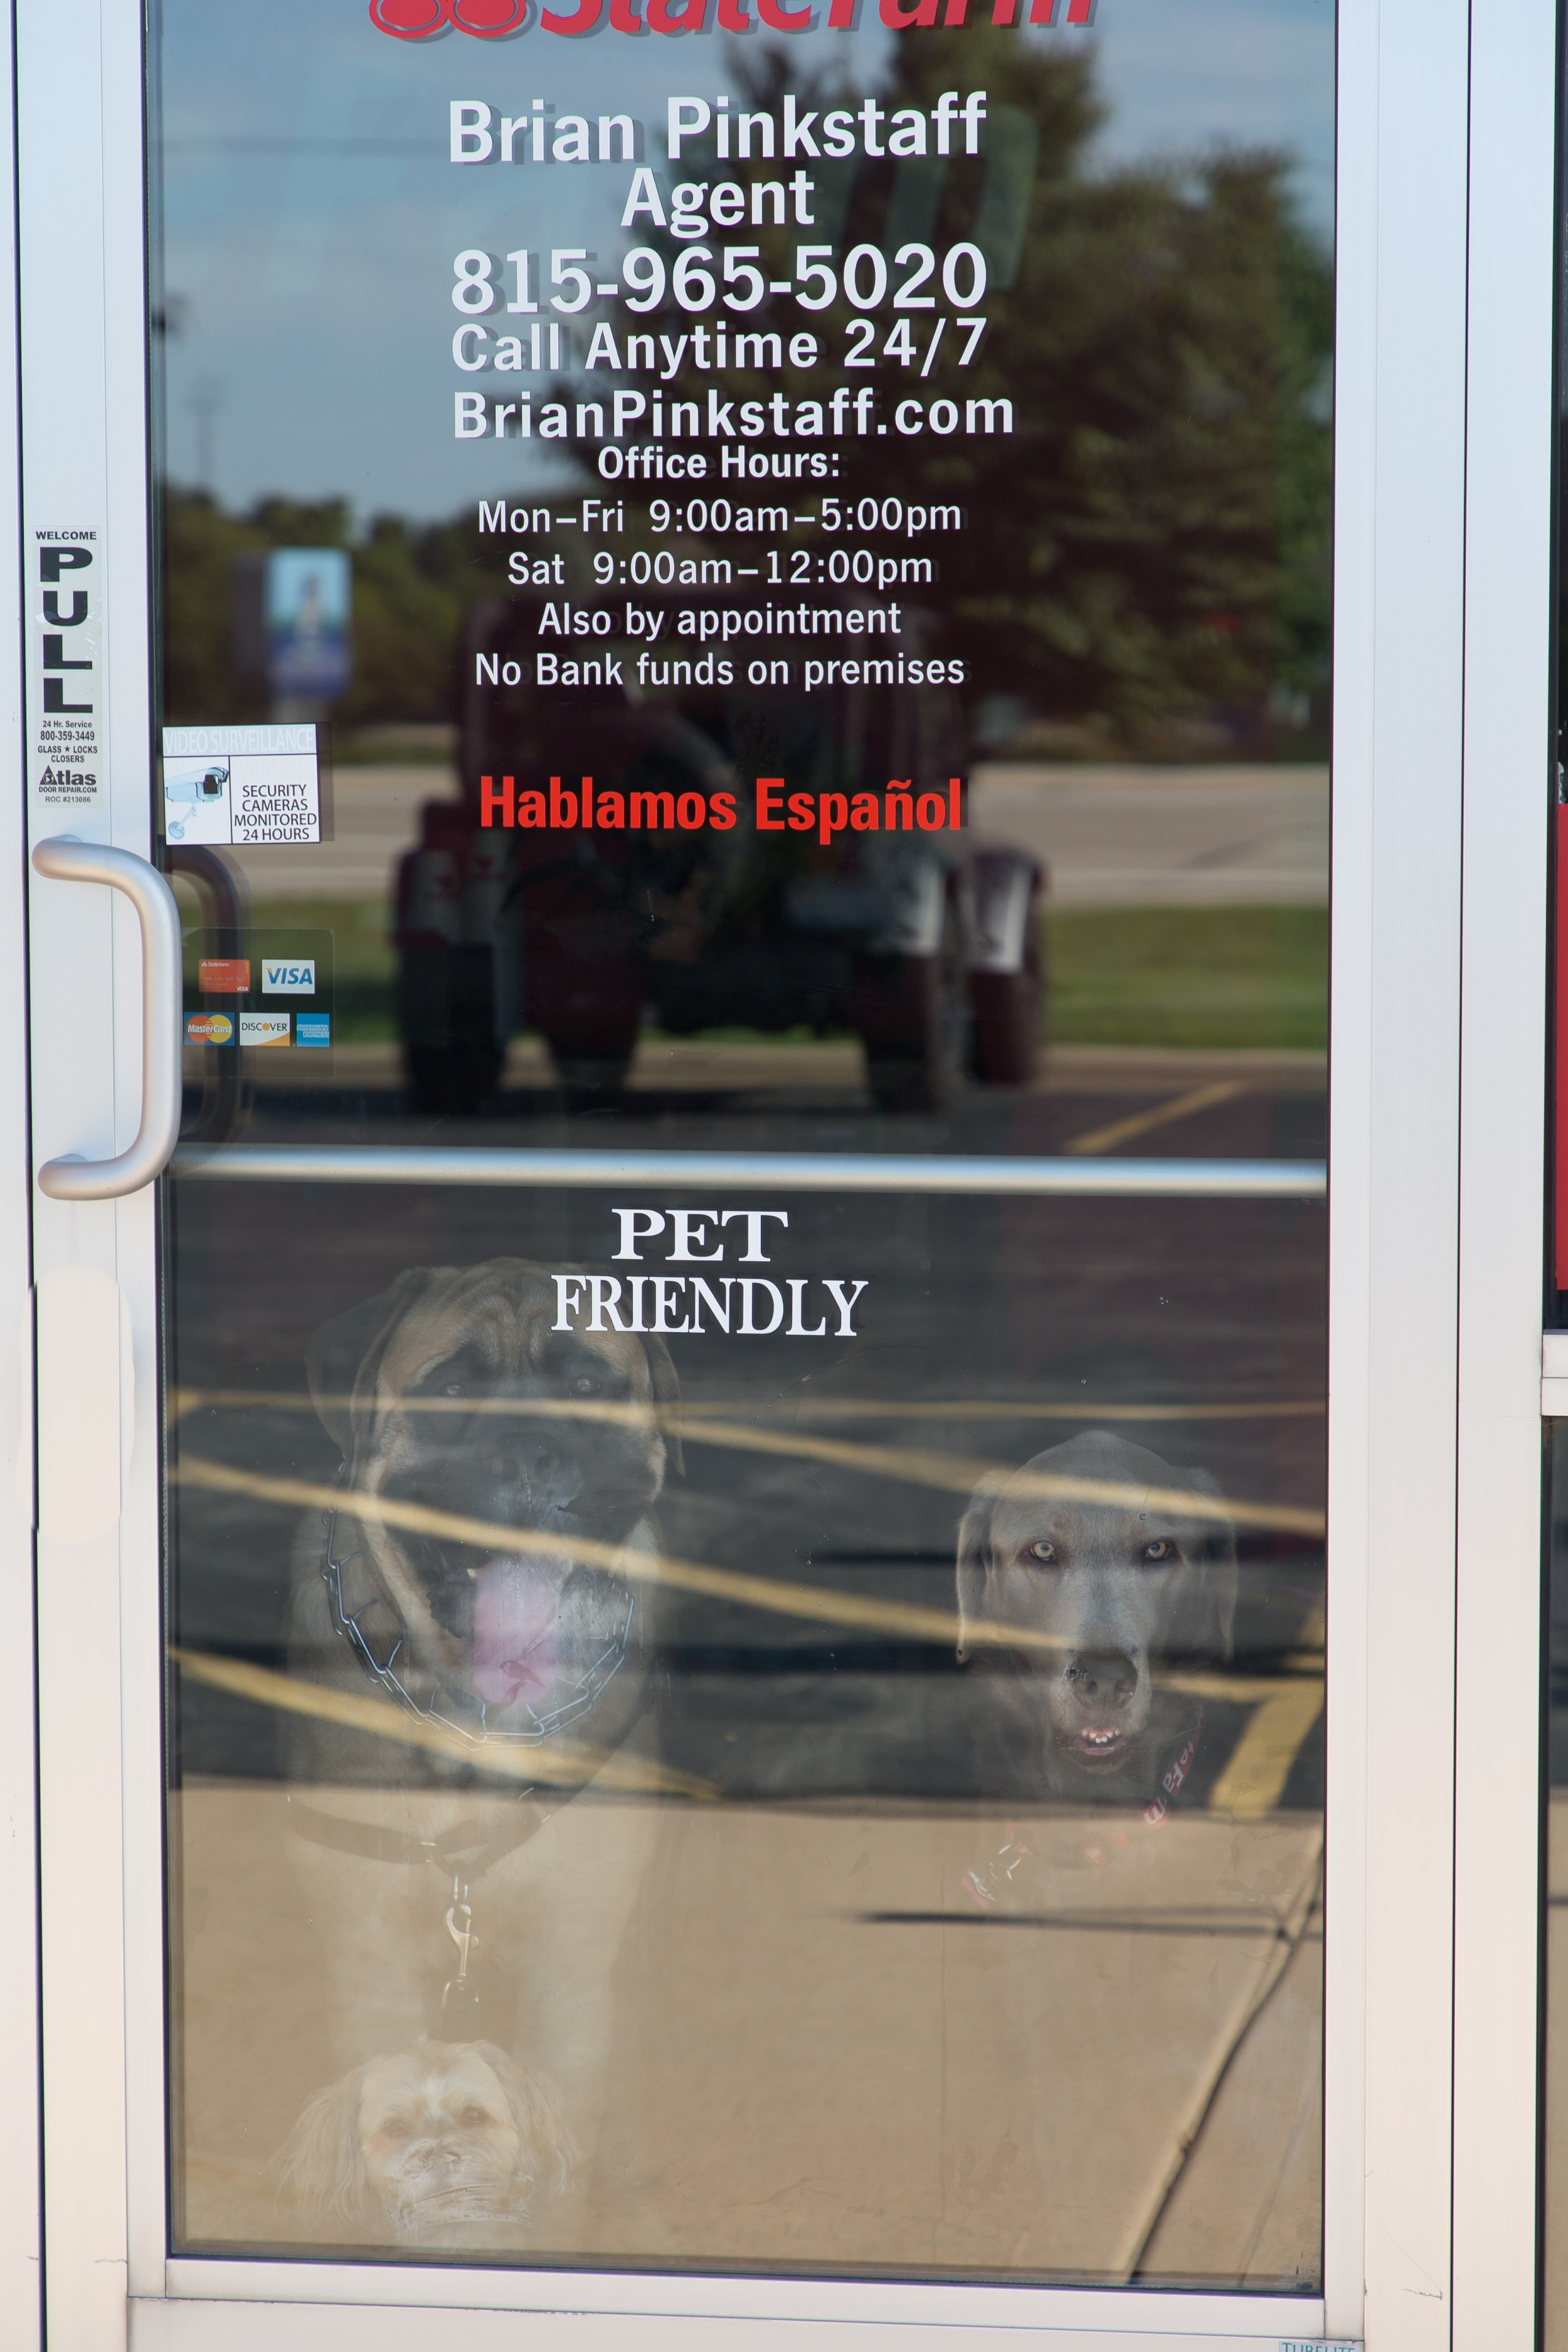 State Farm Insurance Agent Brian Pinkstaff Insuring Pets Virtual